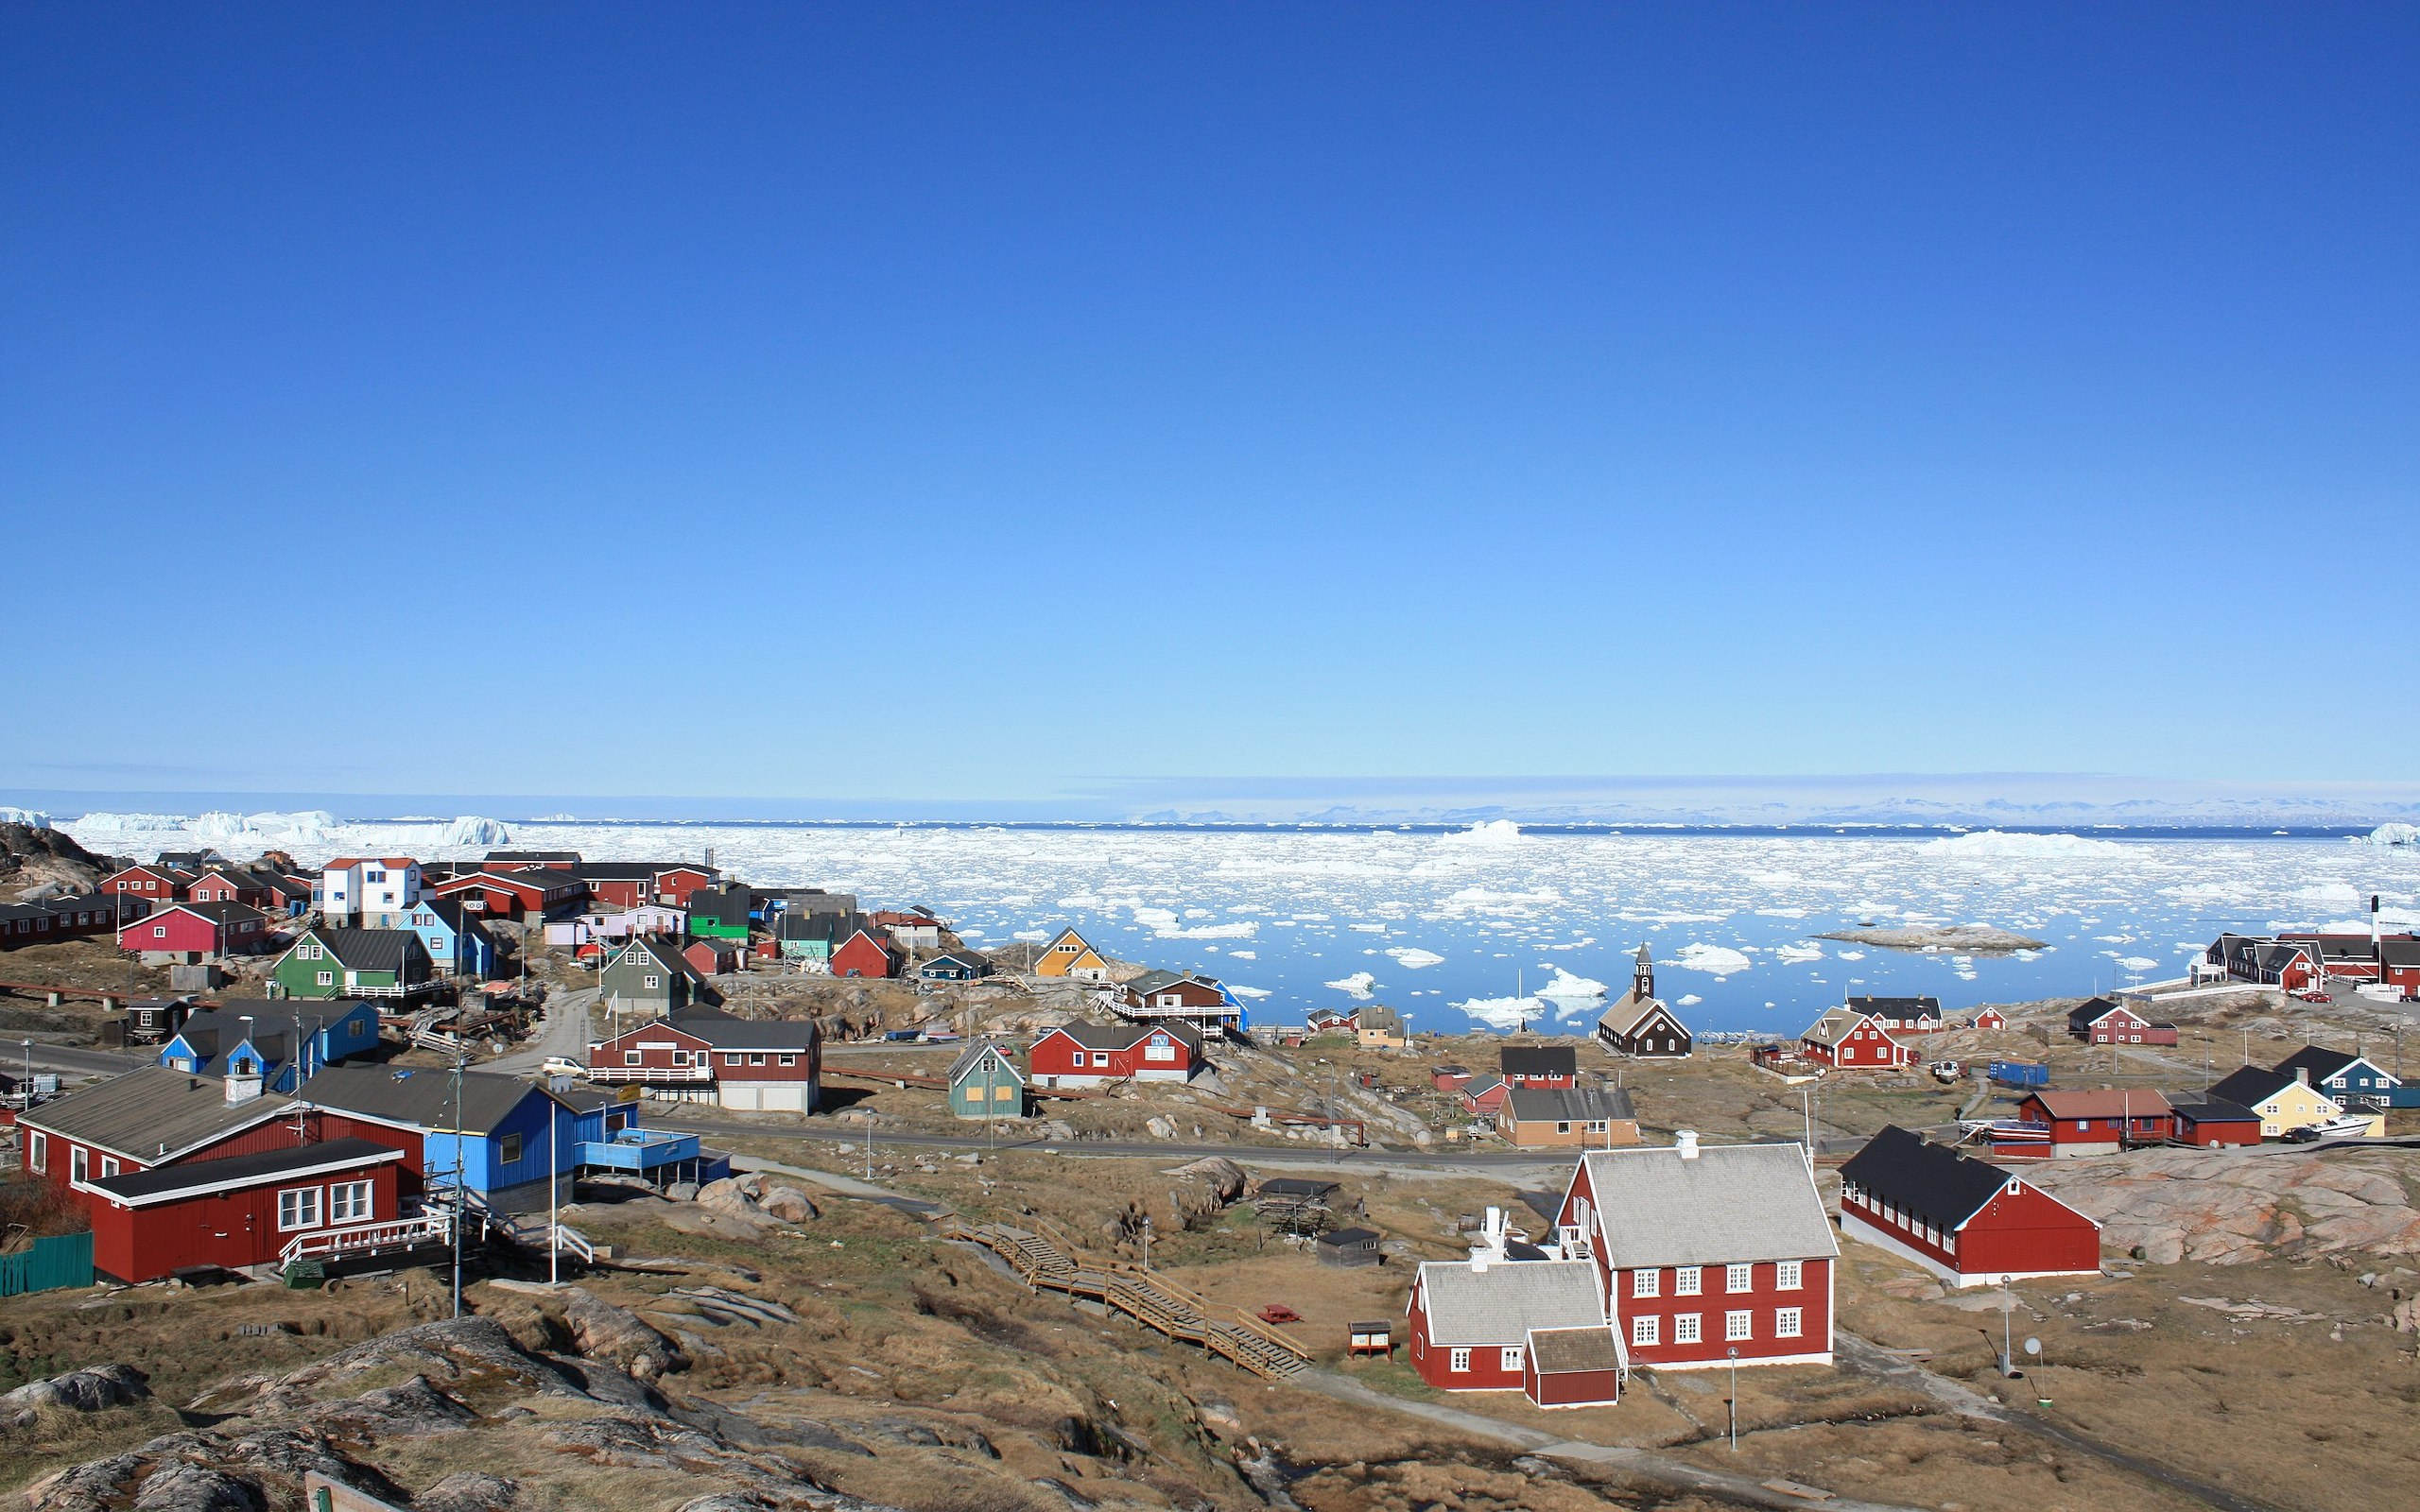 Grönland-Westküste (Narsaq, Umanak, Ilulissat, Diskobucht)